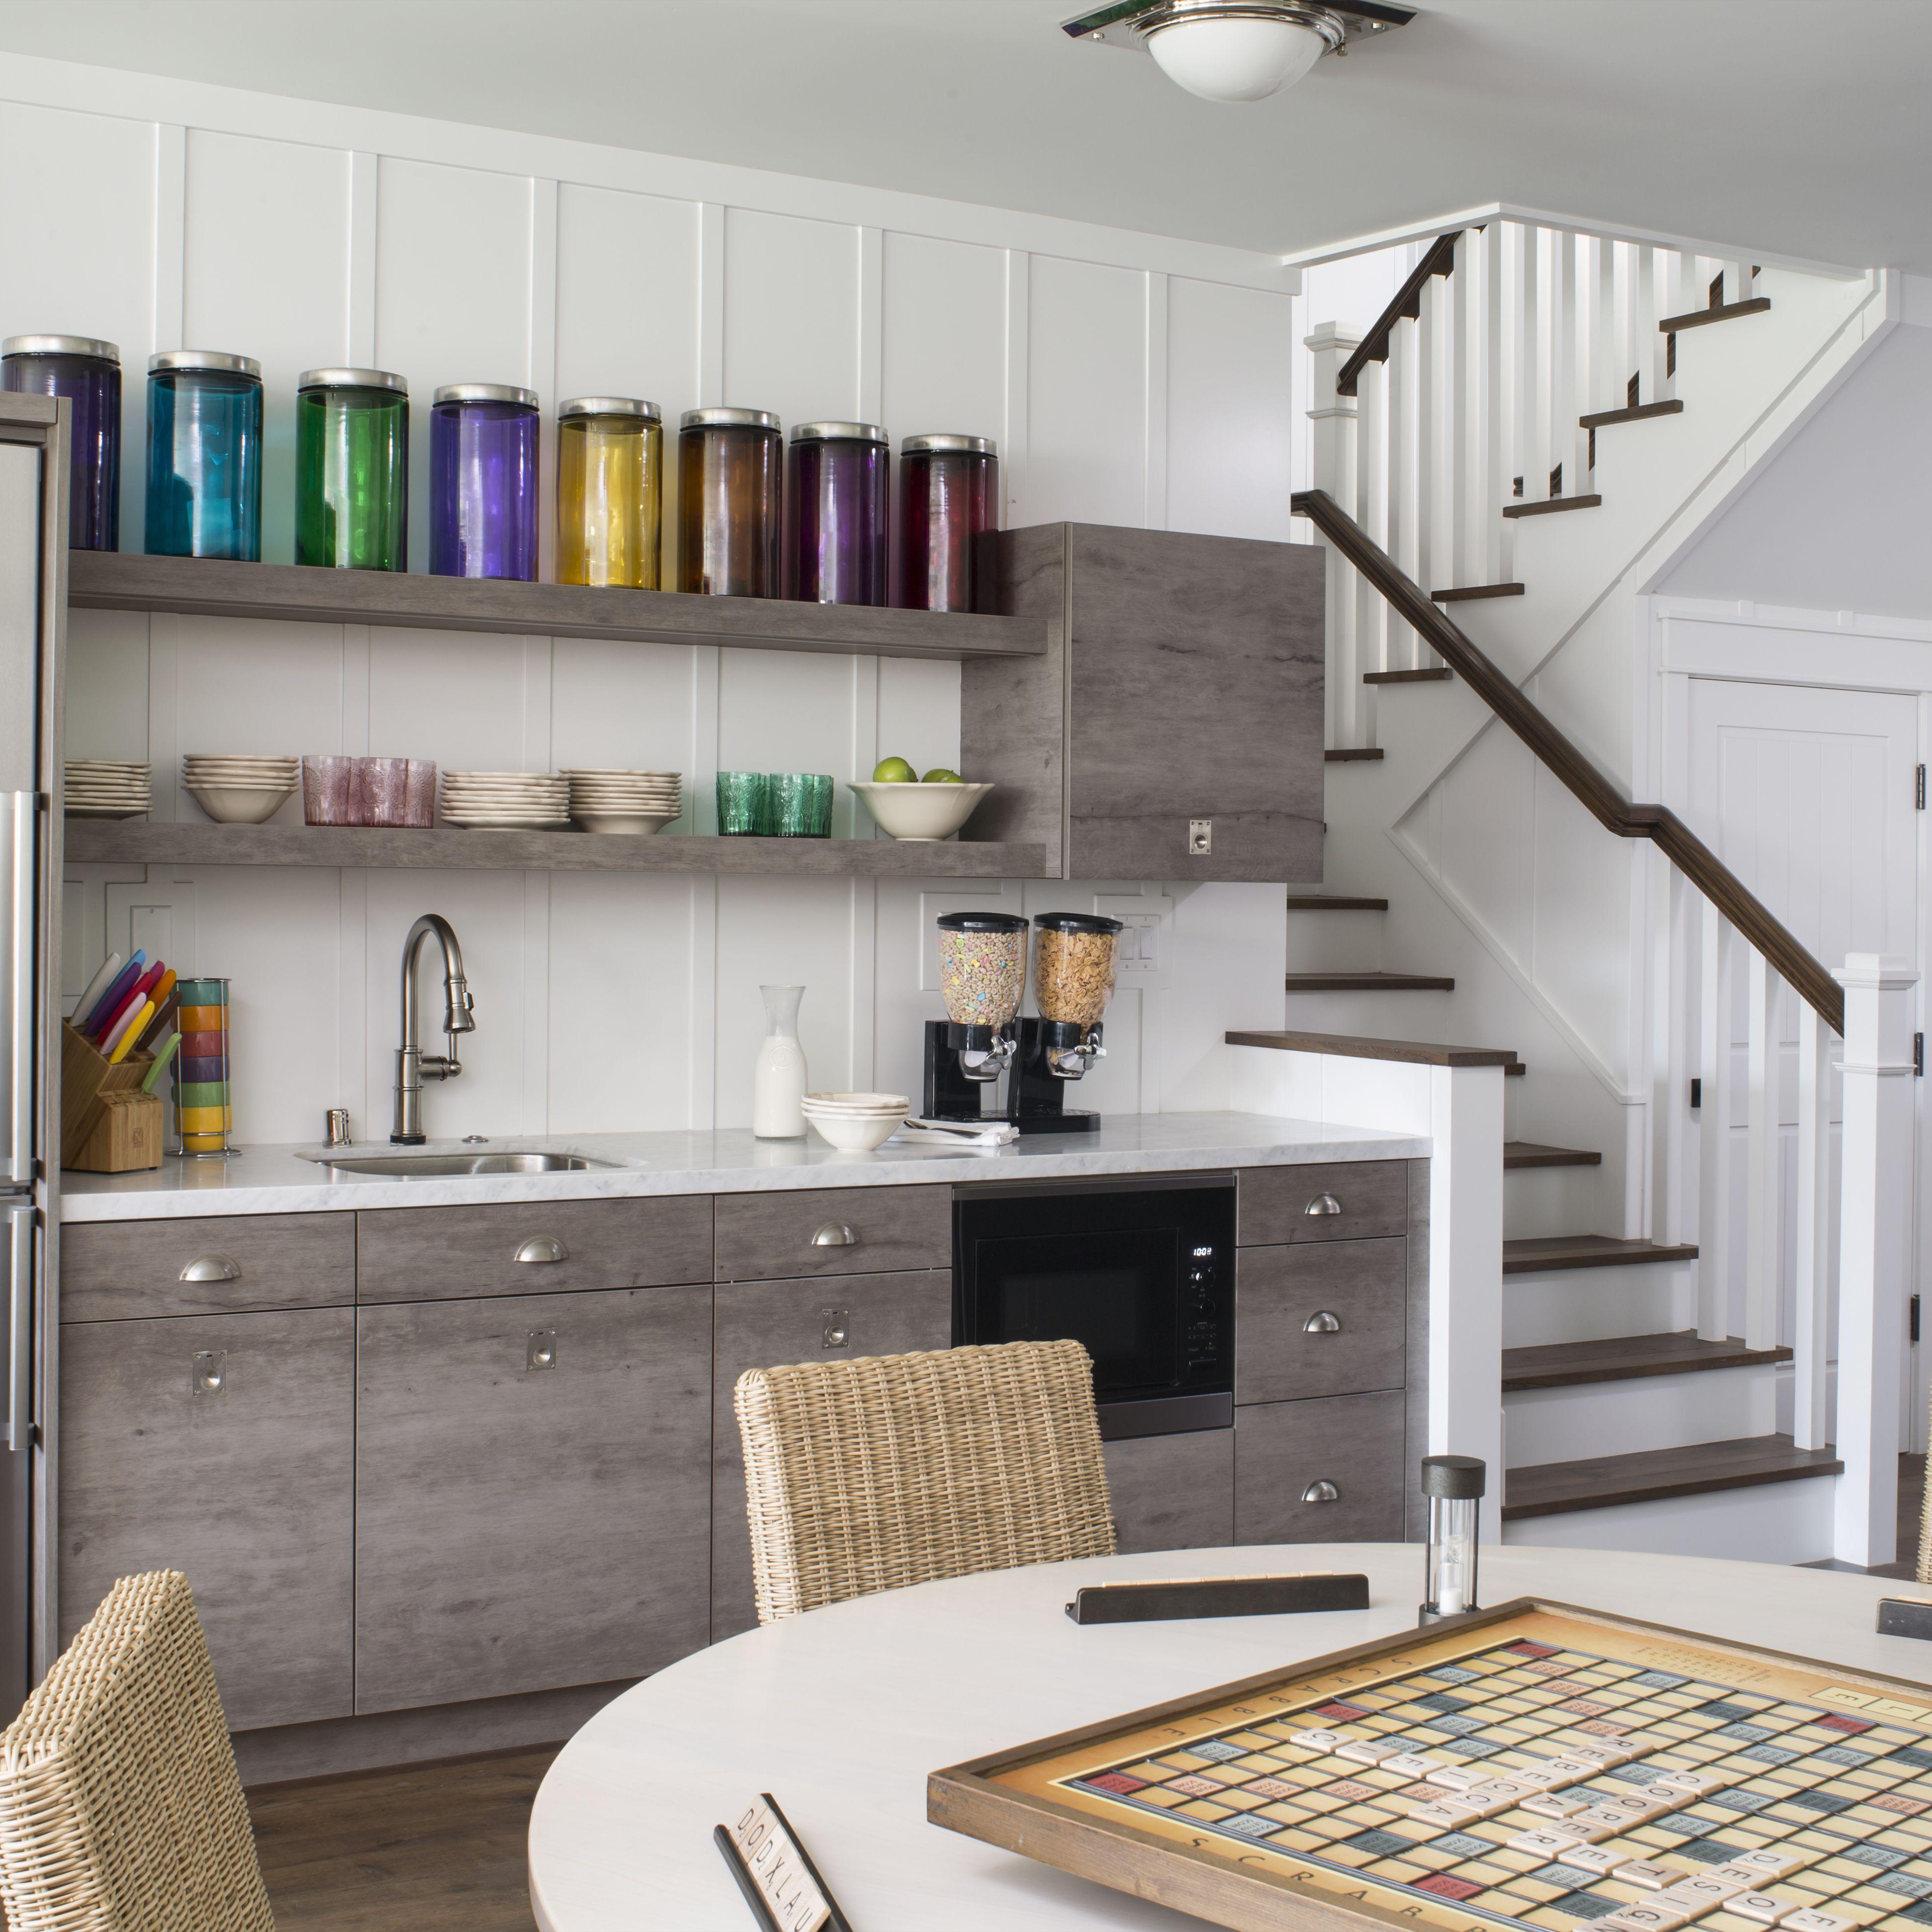 Basement Kitchenette Ideas